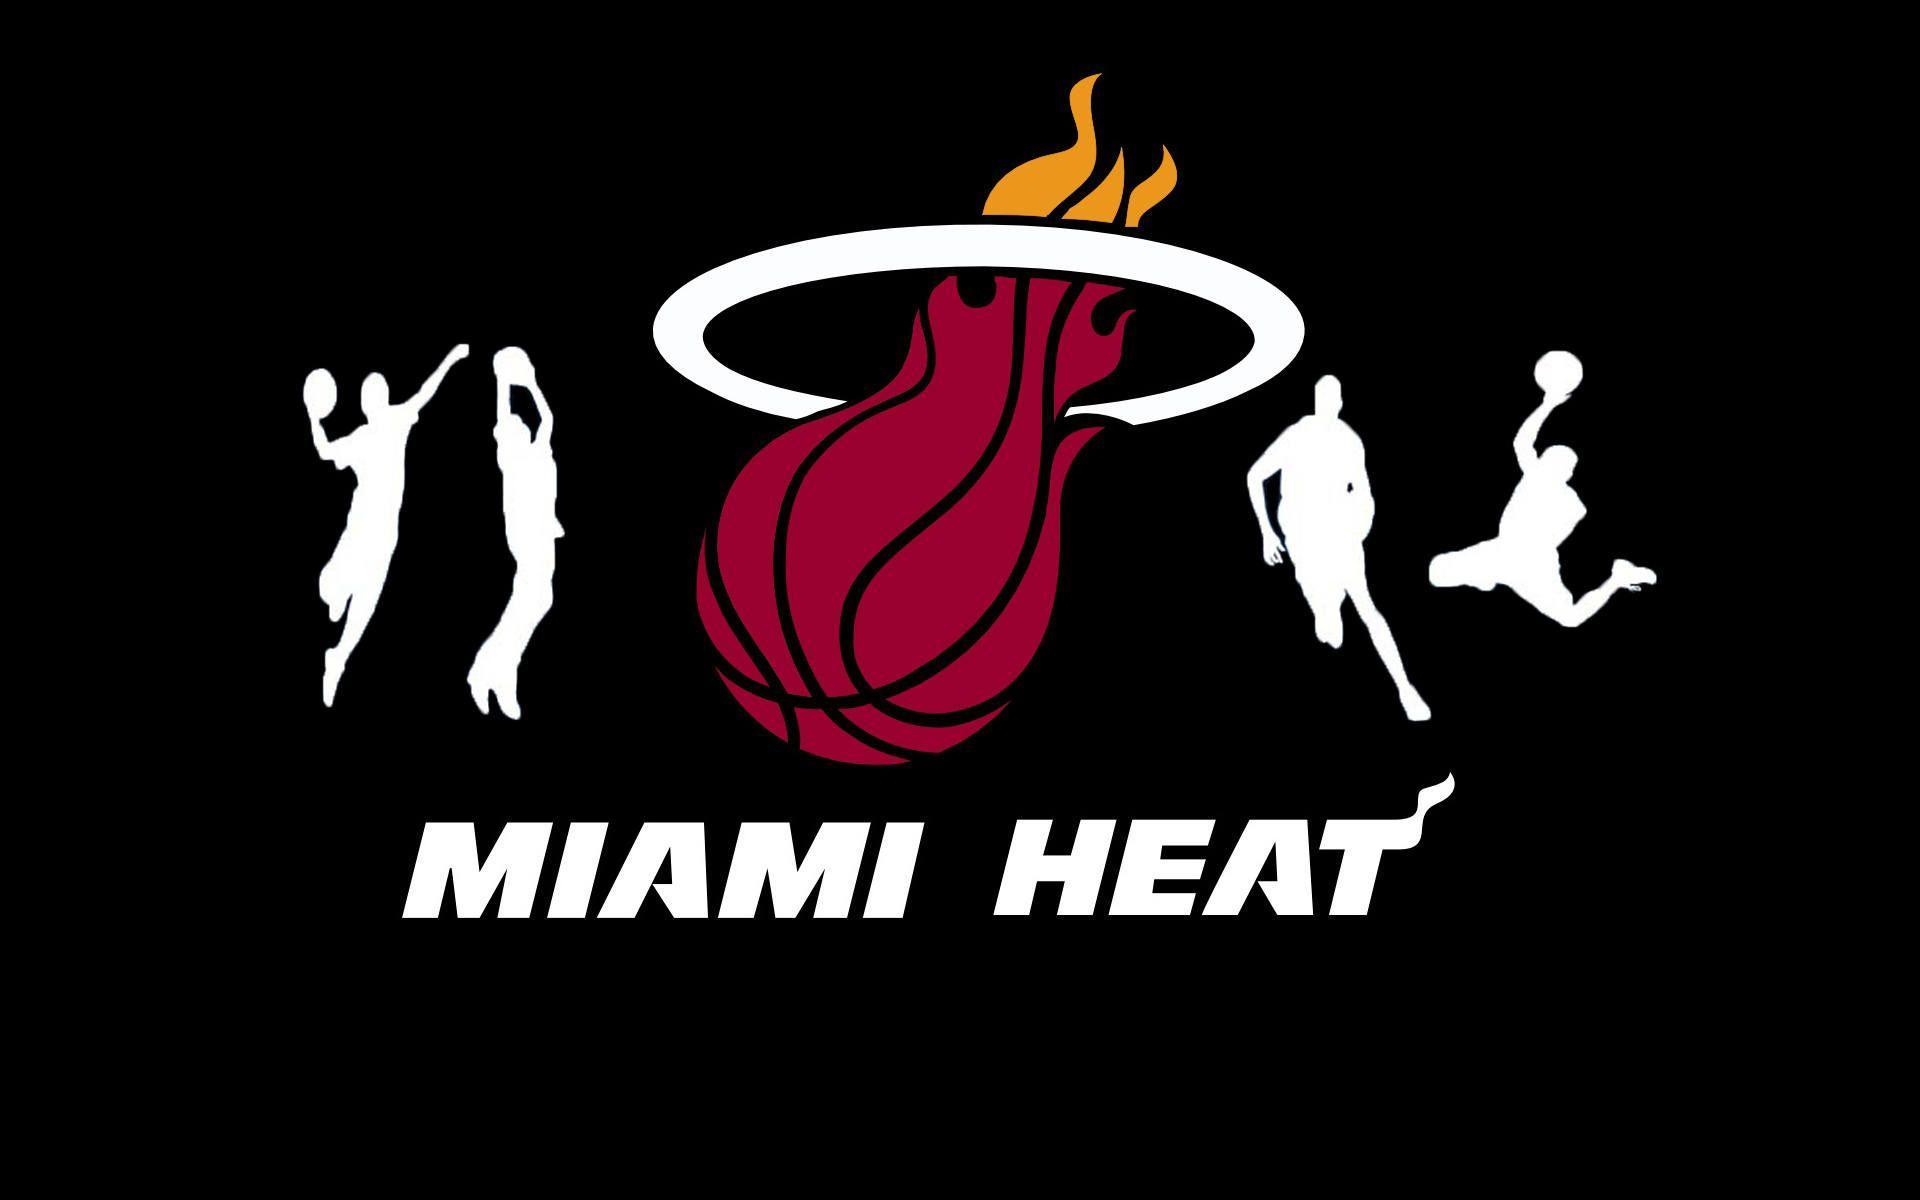 Miami heat logo wallpapers wallpaper cave miami heat logo black background wallpaper 47 13567 wallpaper voltagebd Choice Image